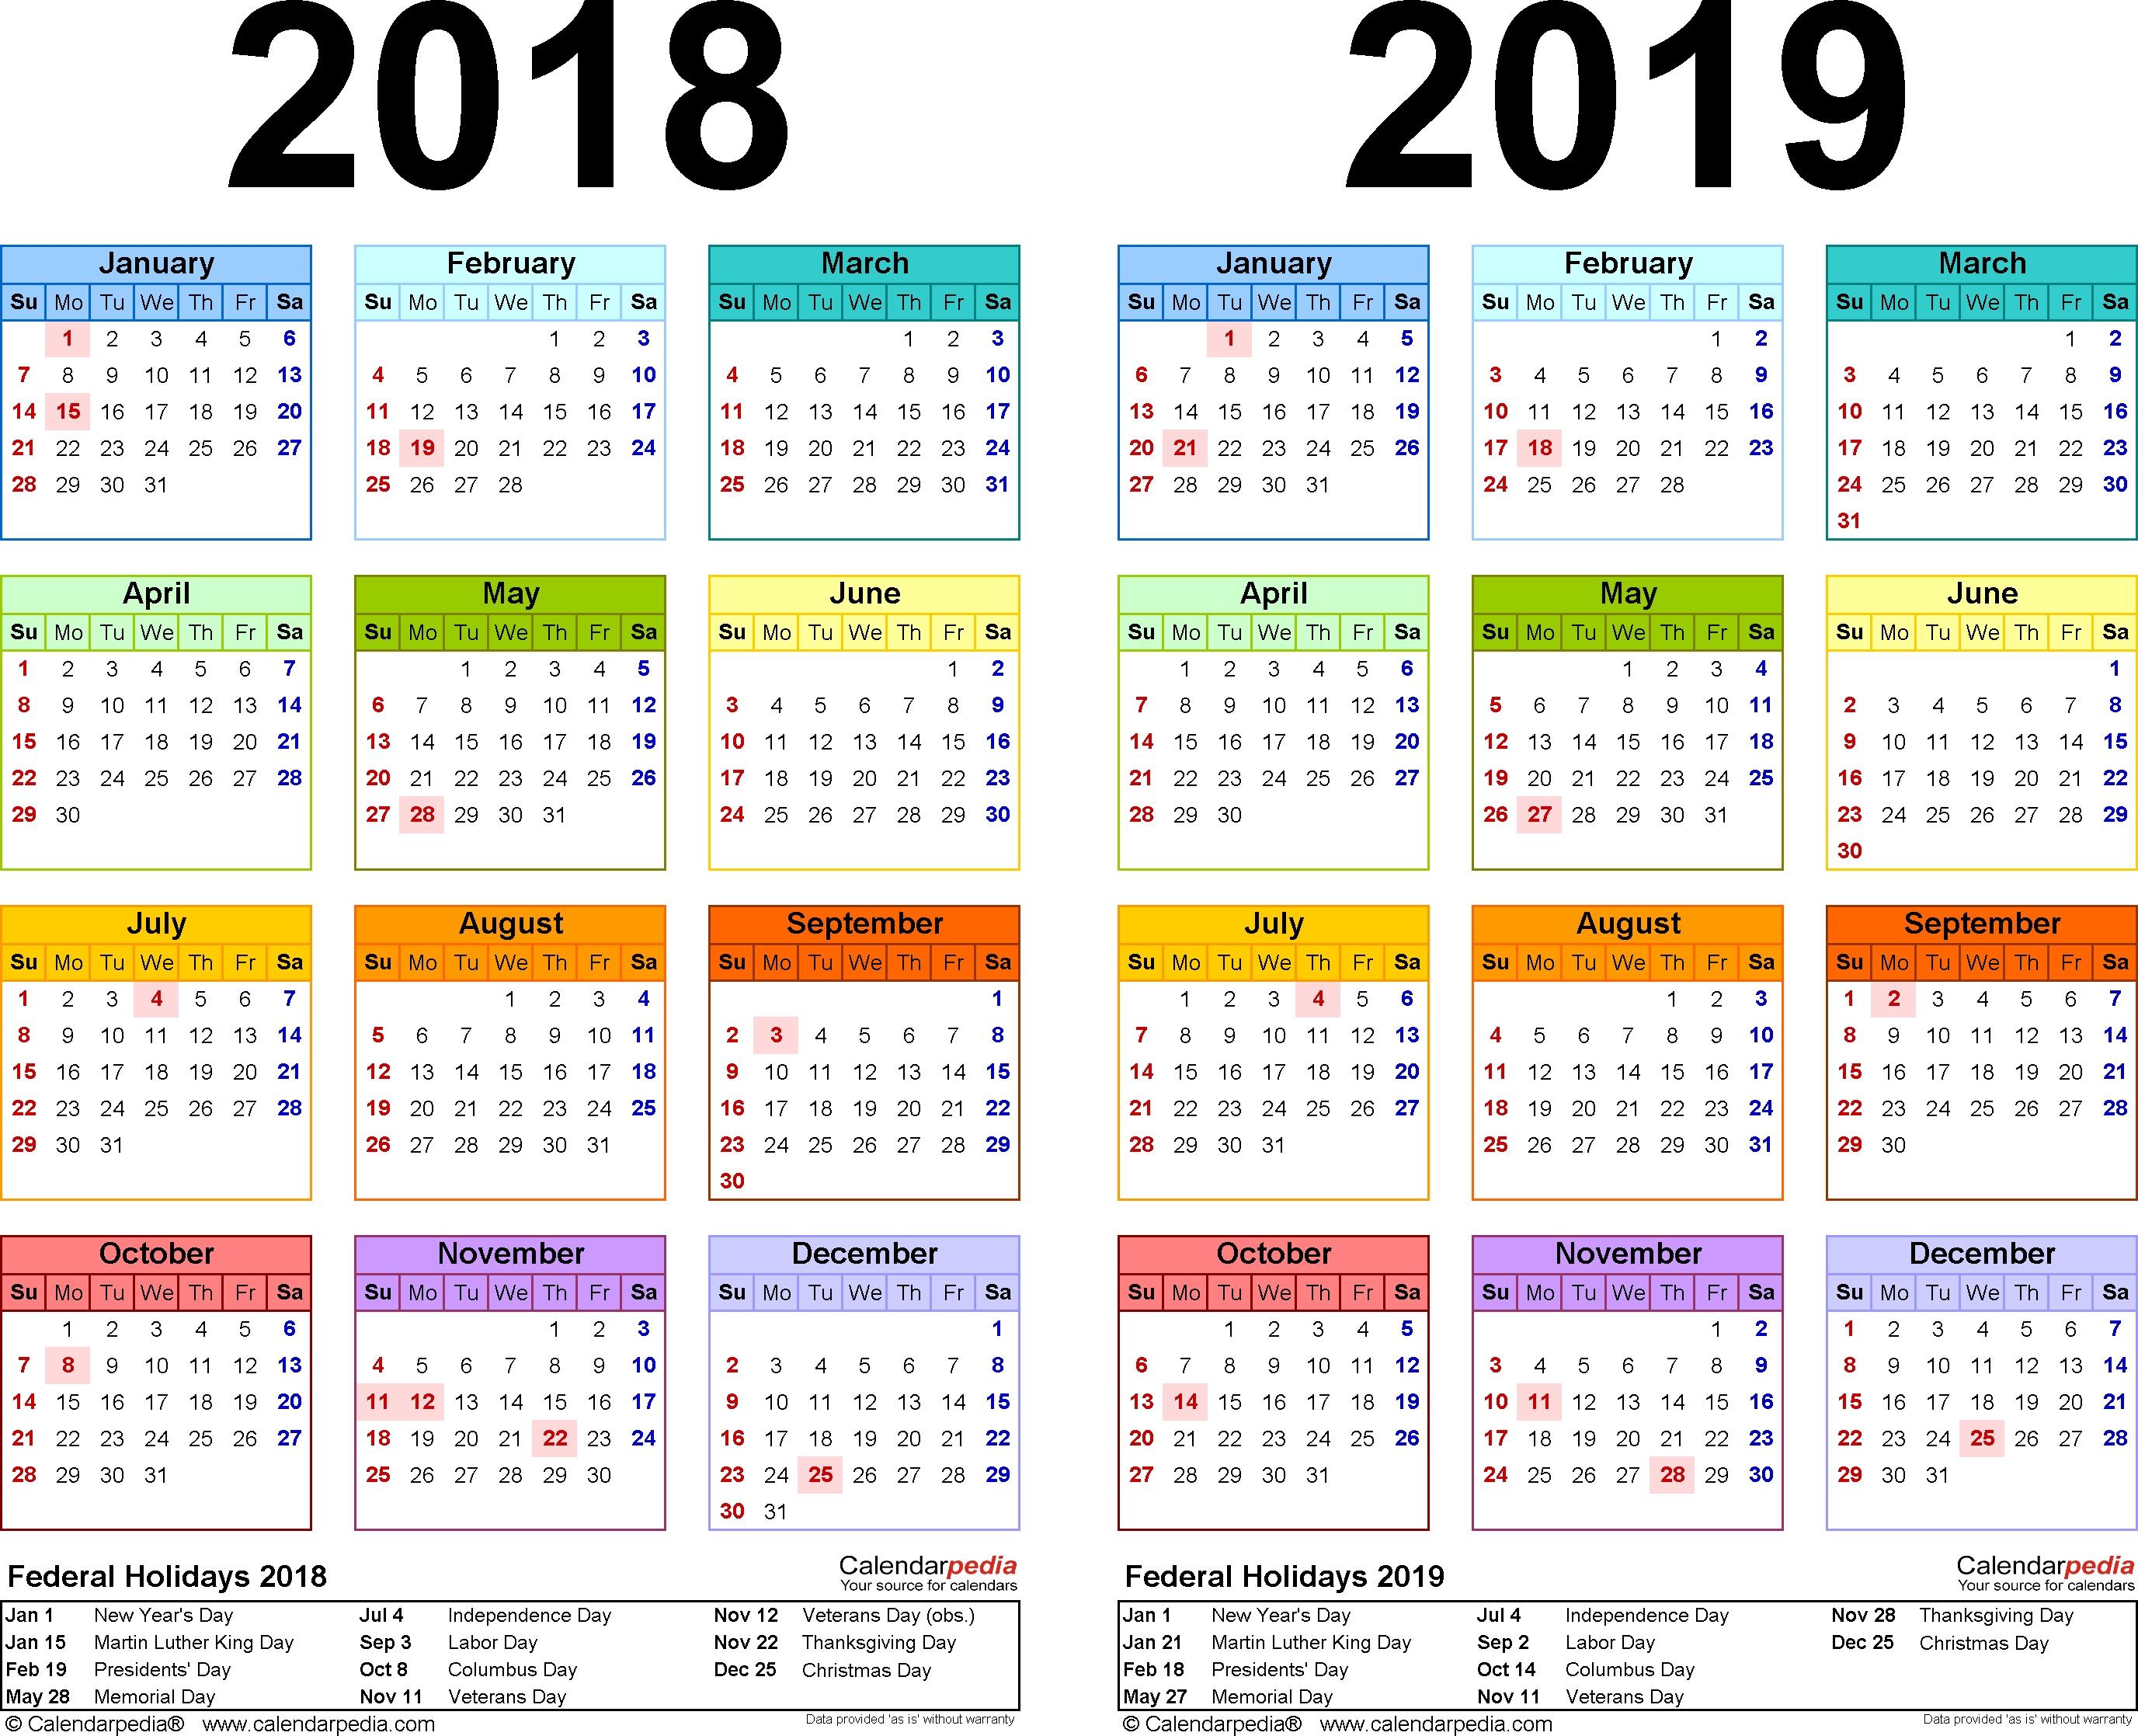 2018-2019 Calendar - Free Printable Two-Year Pdf Calendars regarding 1 Page Year Long Calendar Printable Free